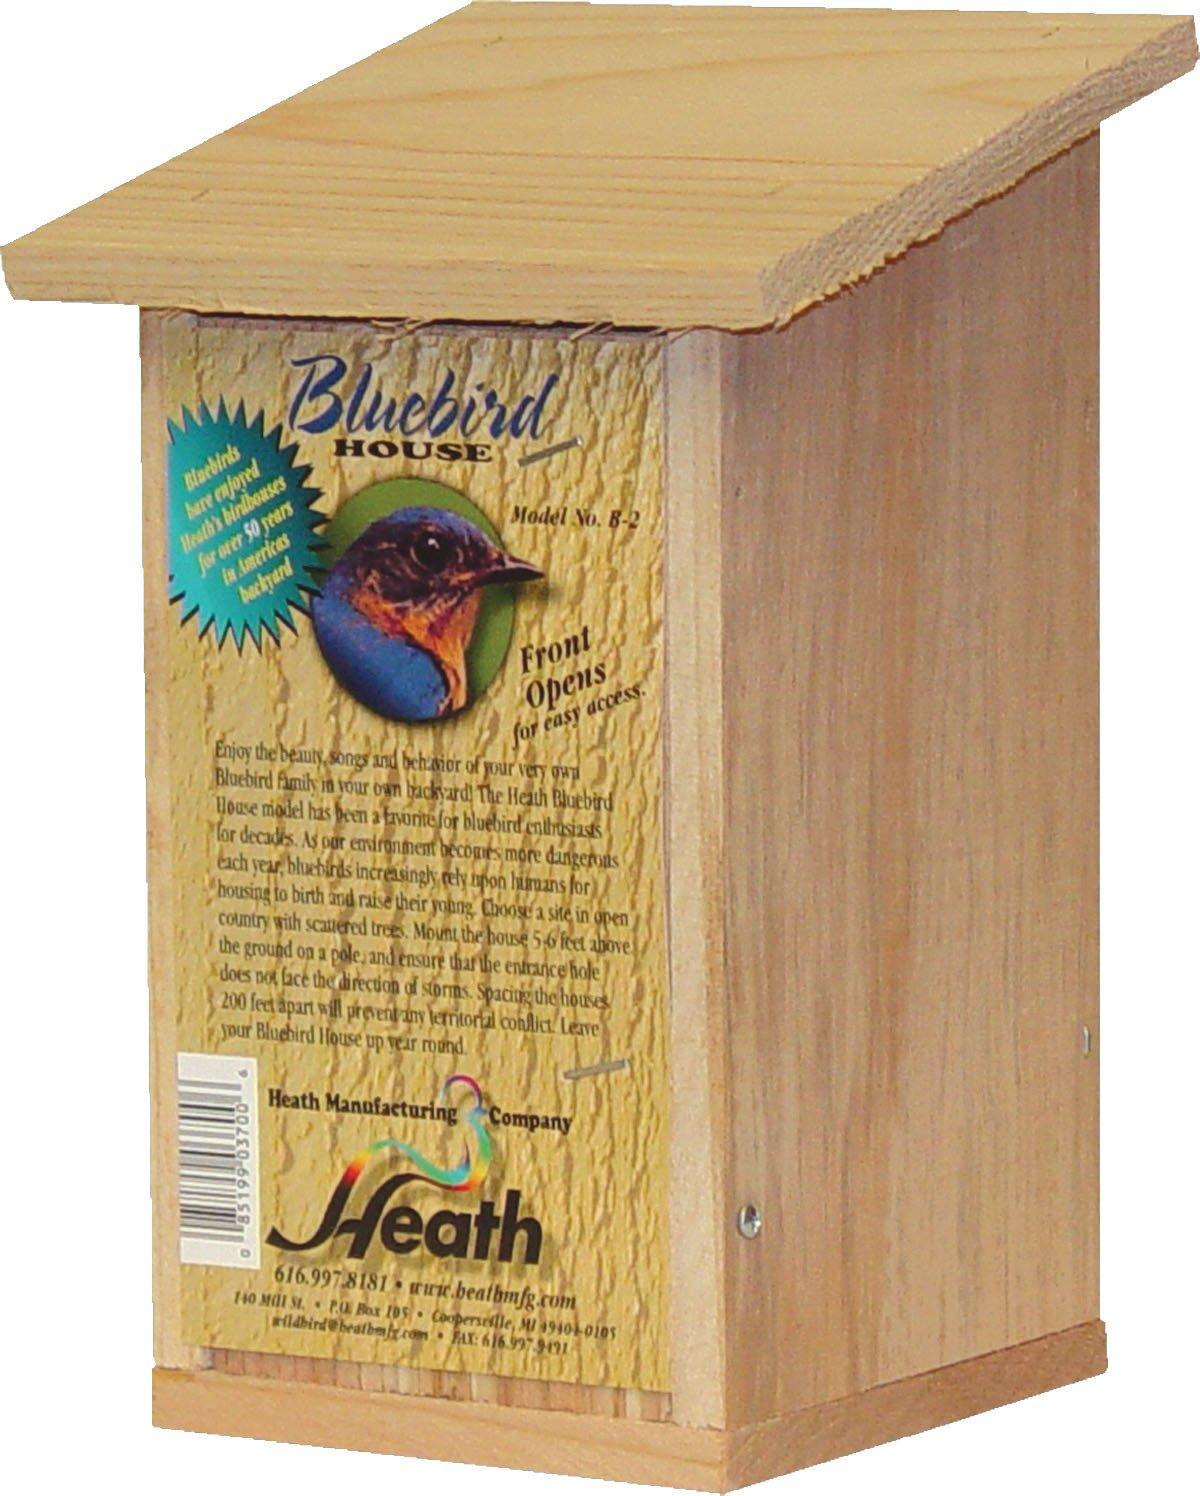 Heath Mfg Co P-Bluebird House- Brown | Products | Pinterest ...